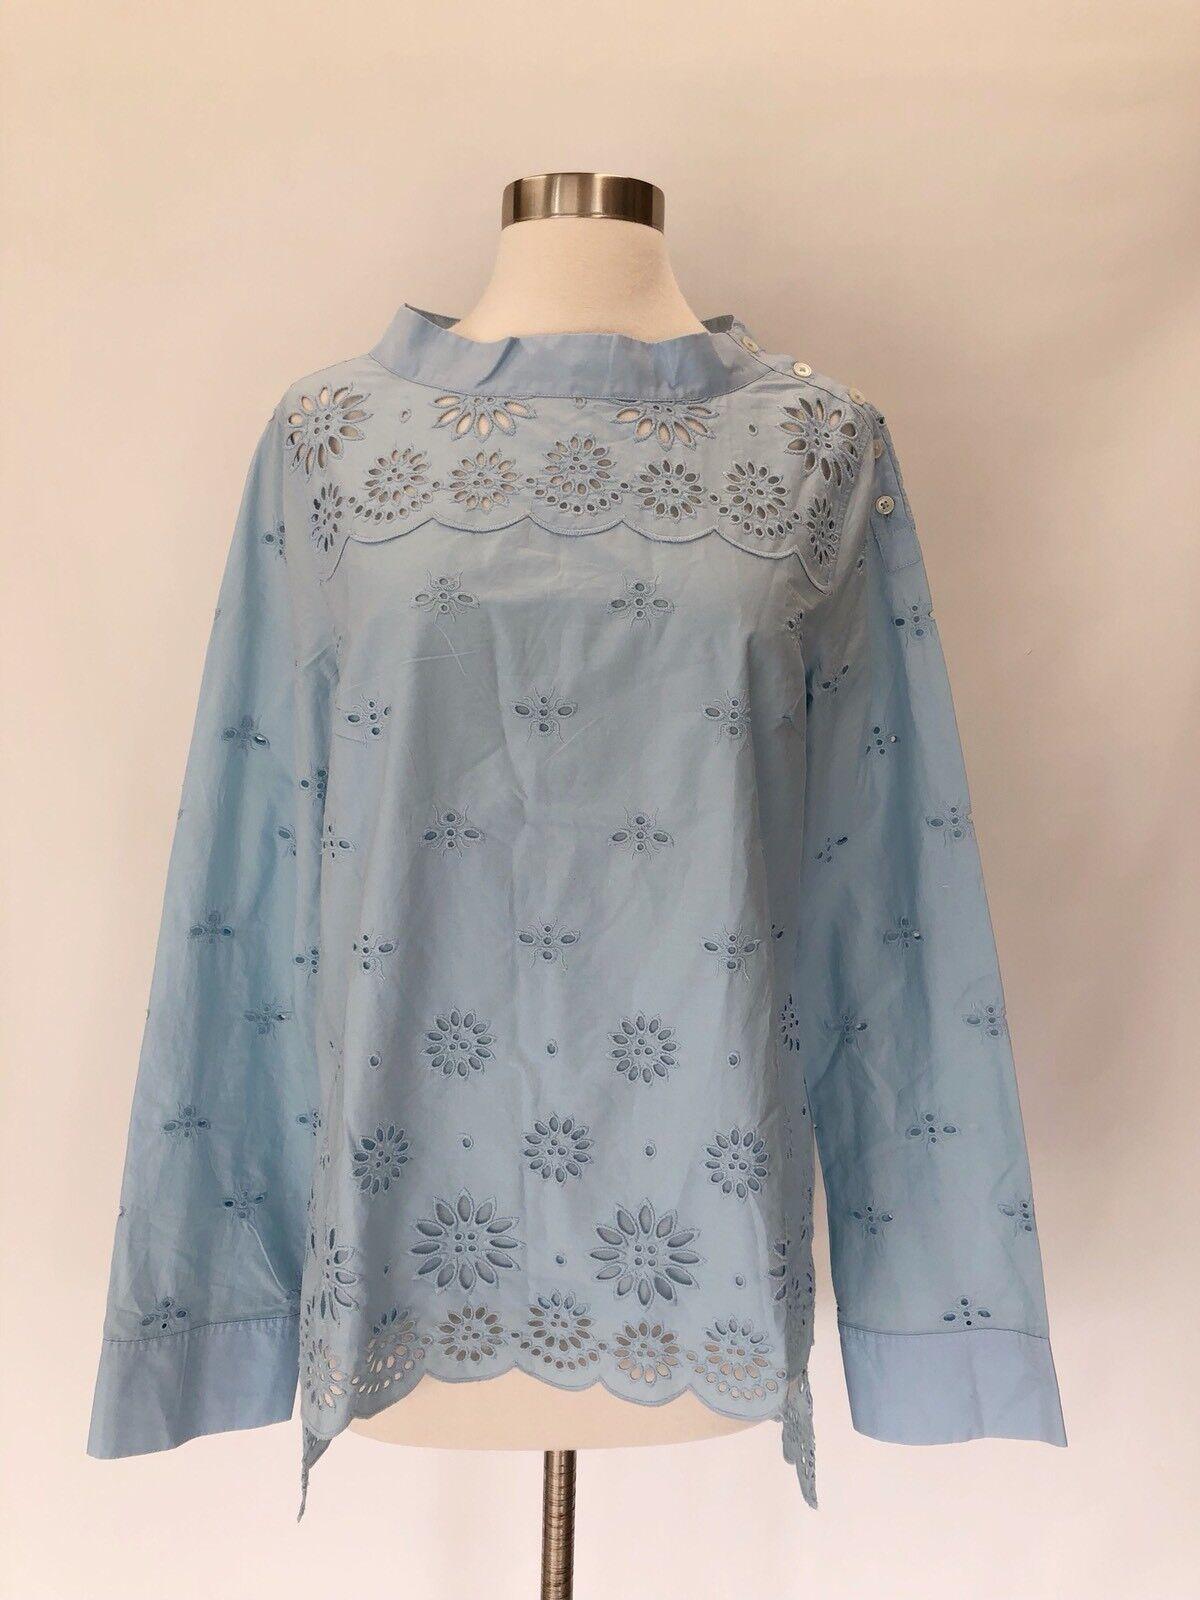 New J.Crew Tall Funnelneck shirt top blouse in eyelet Misty Blau Größe 4T 4 H7574